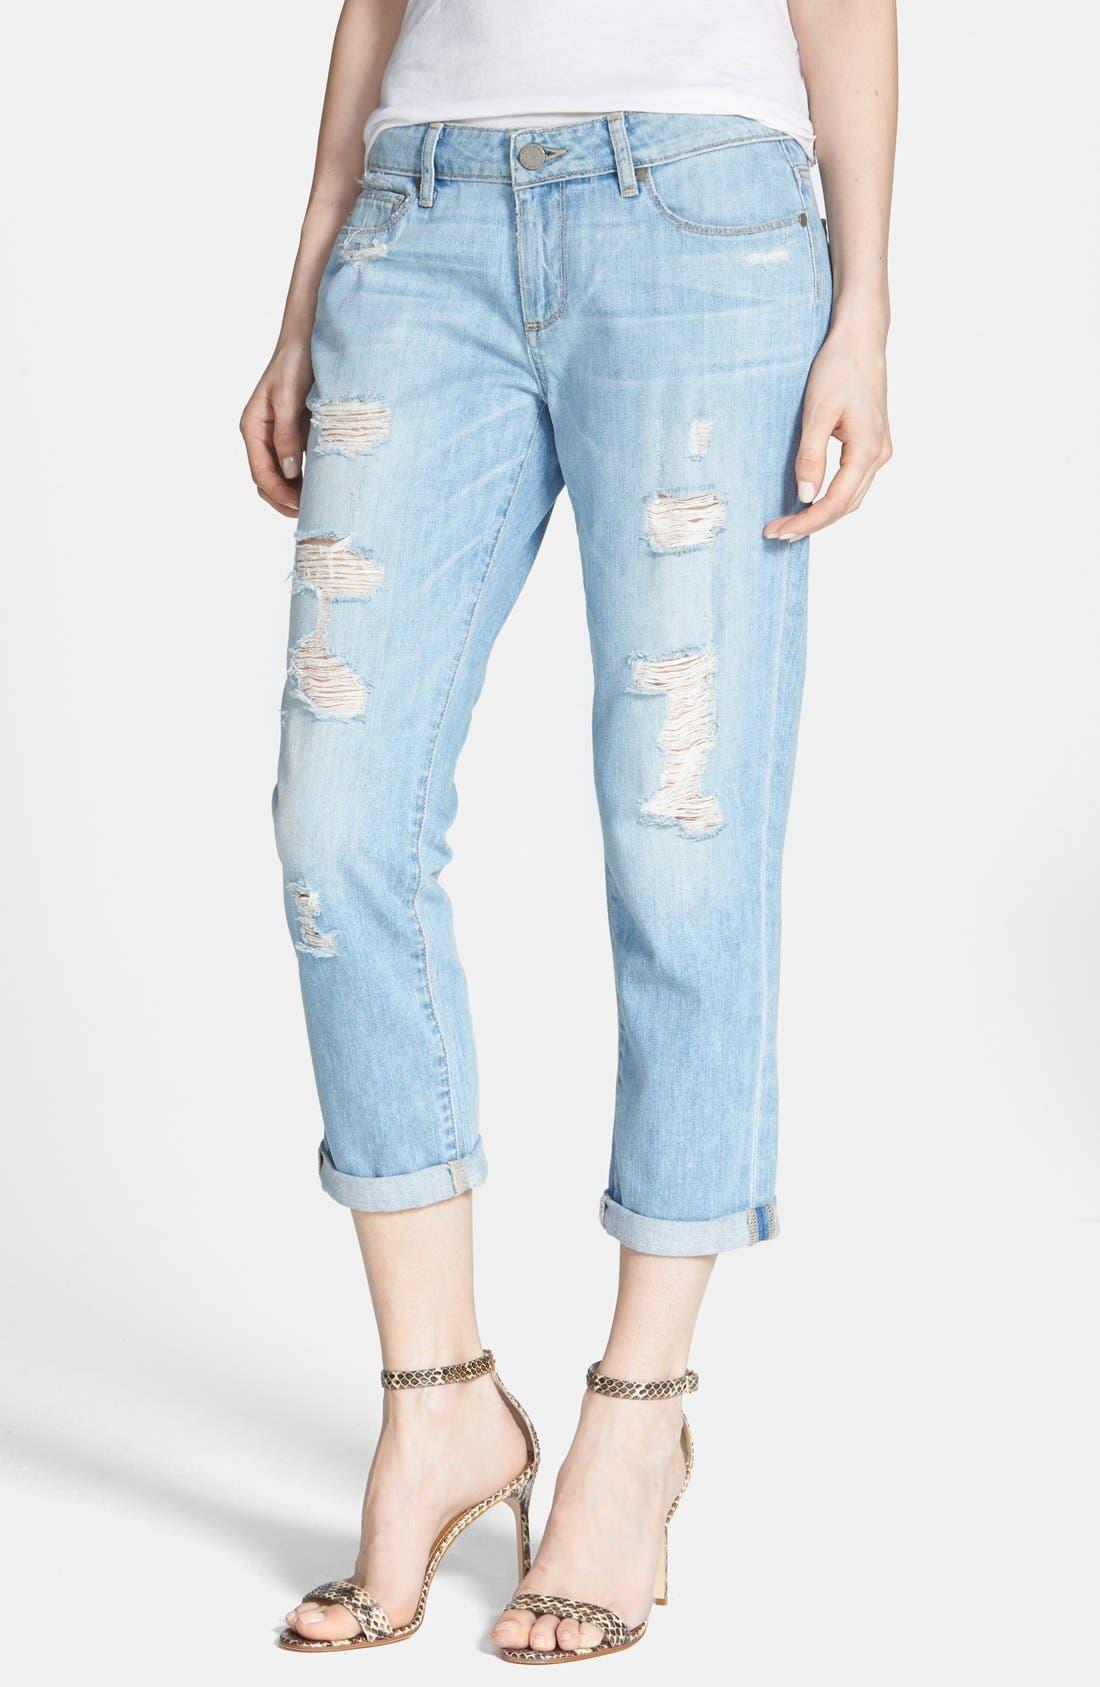 Alternate Image 1 Selected - Paige Denim 'Jimmy Jimmy' Destroyed Crop Boyfriend Jeans (Naomi Distressed)